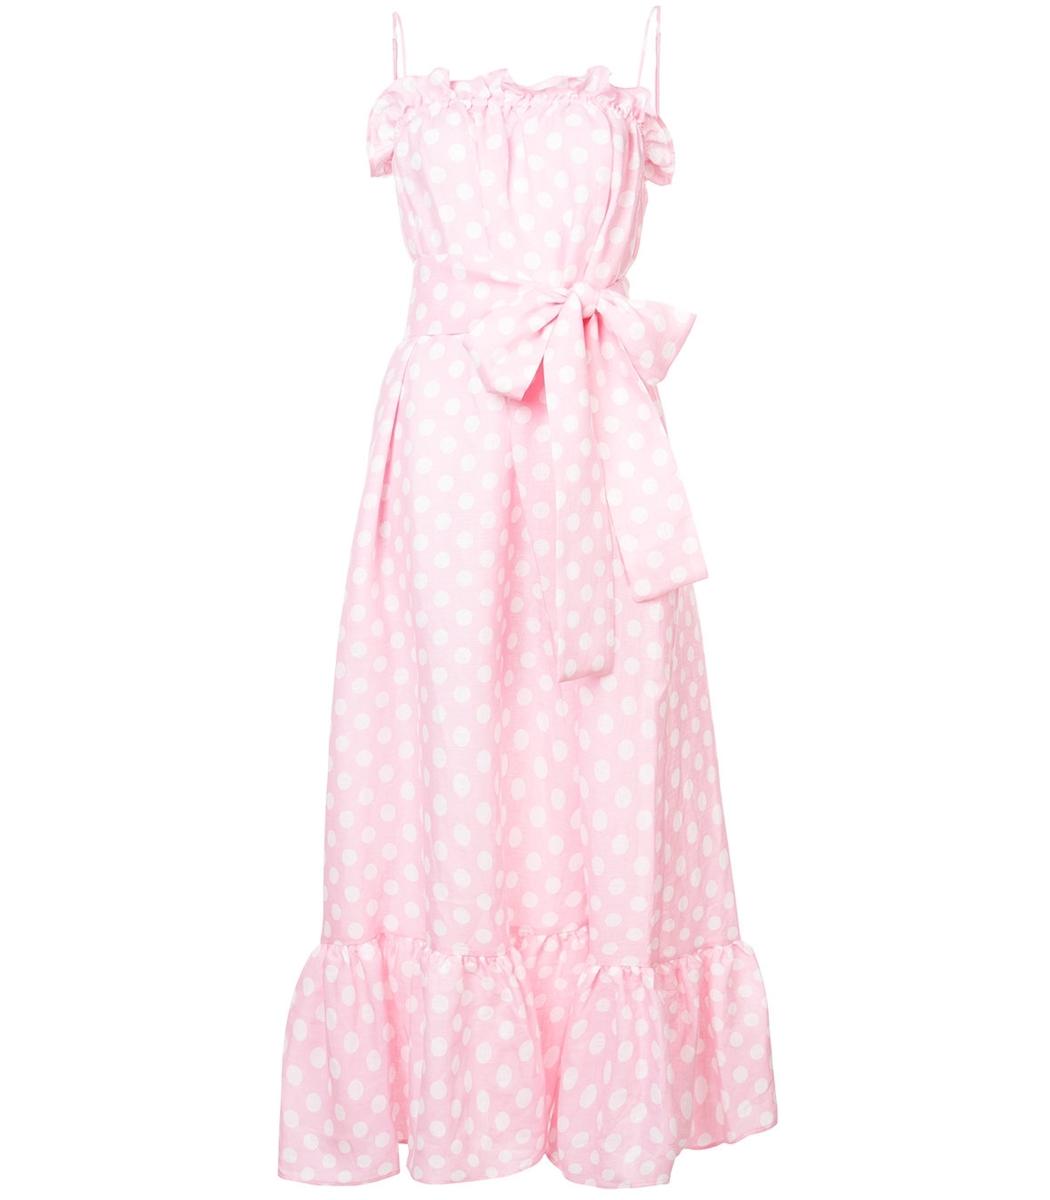 8891848ac7 Lisa Marie Fernandez Liz Polka Dot Linen Maxi Dress - Pink Size 2 In Baby  Pink